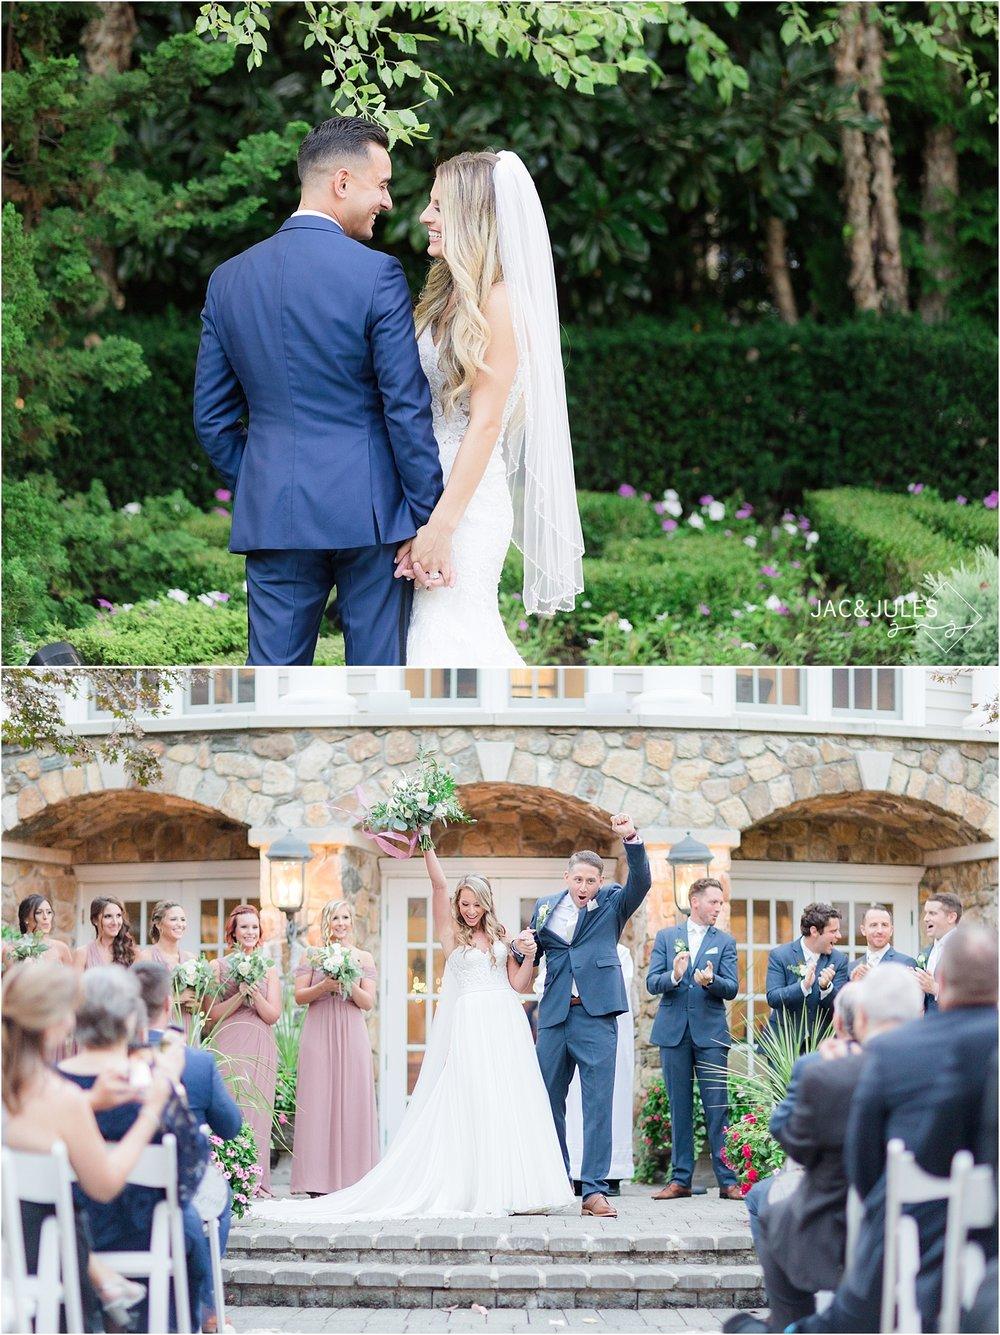 olde mill inn outdoor wedding ceremony photo